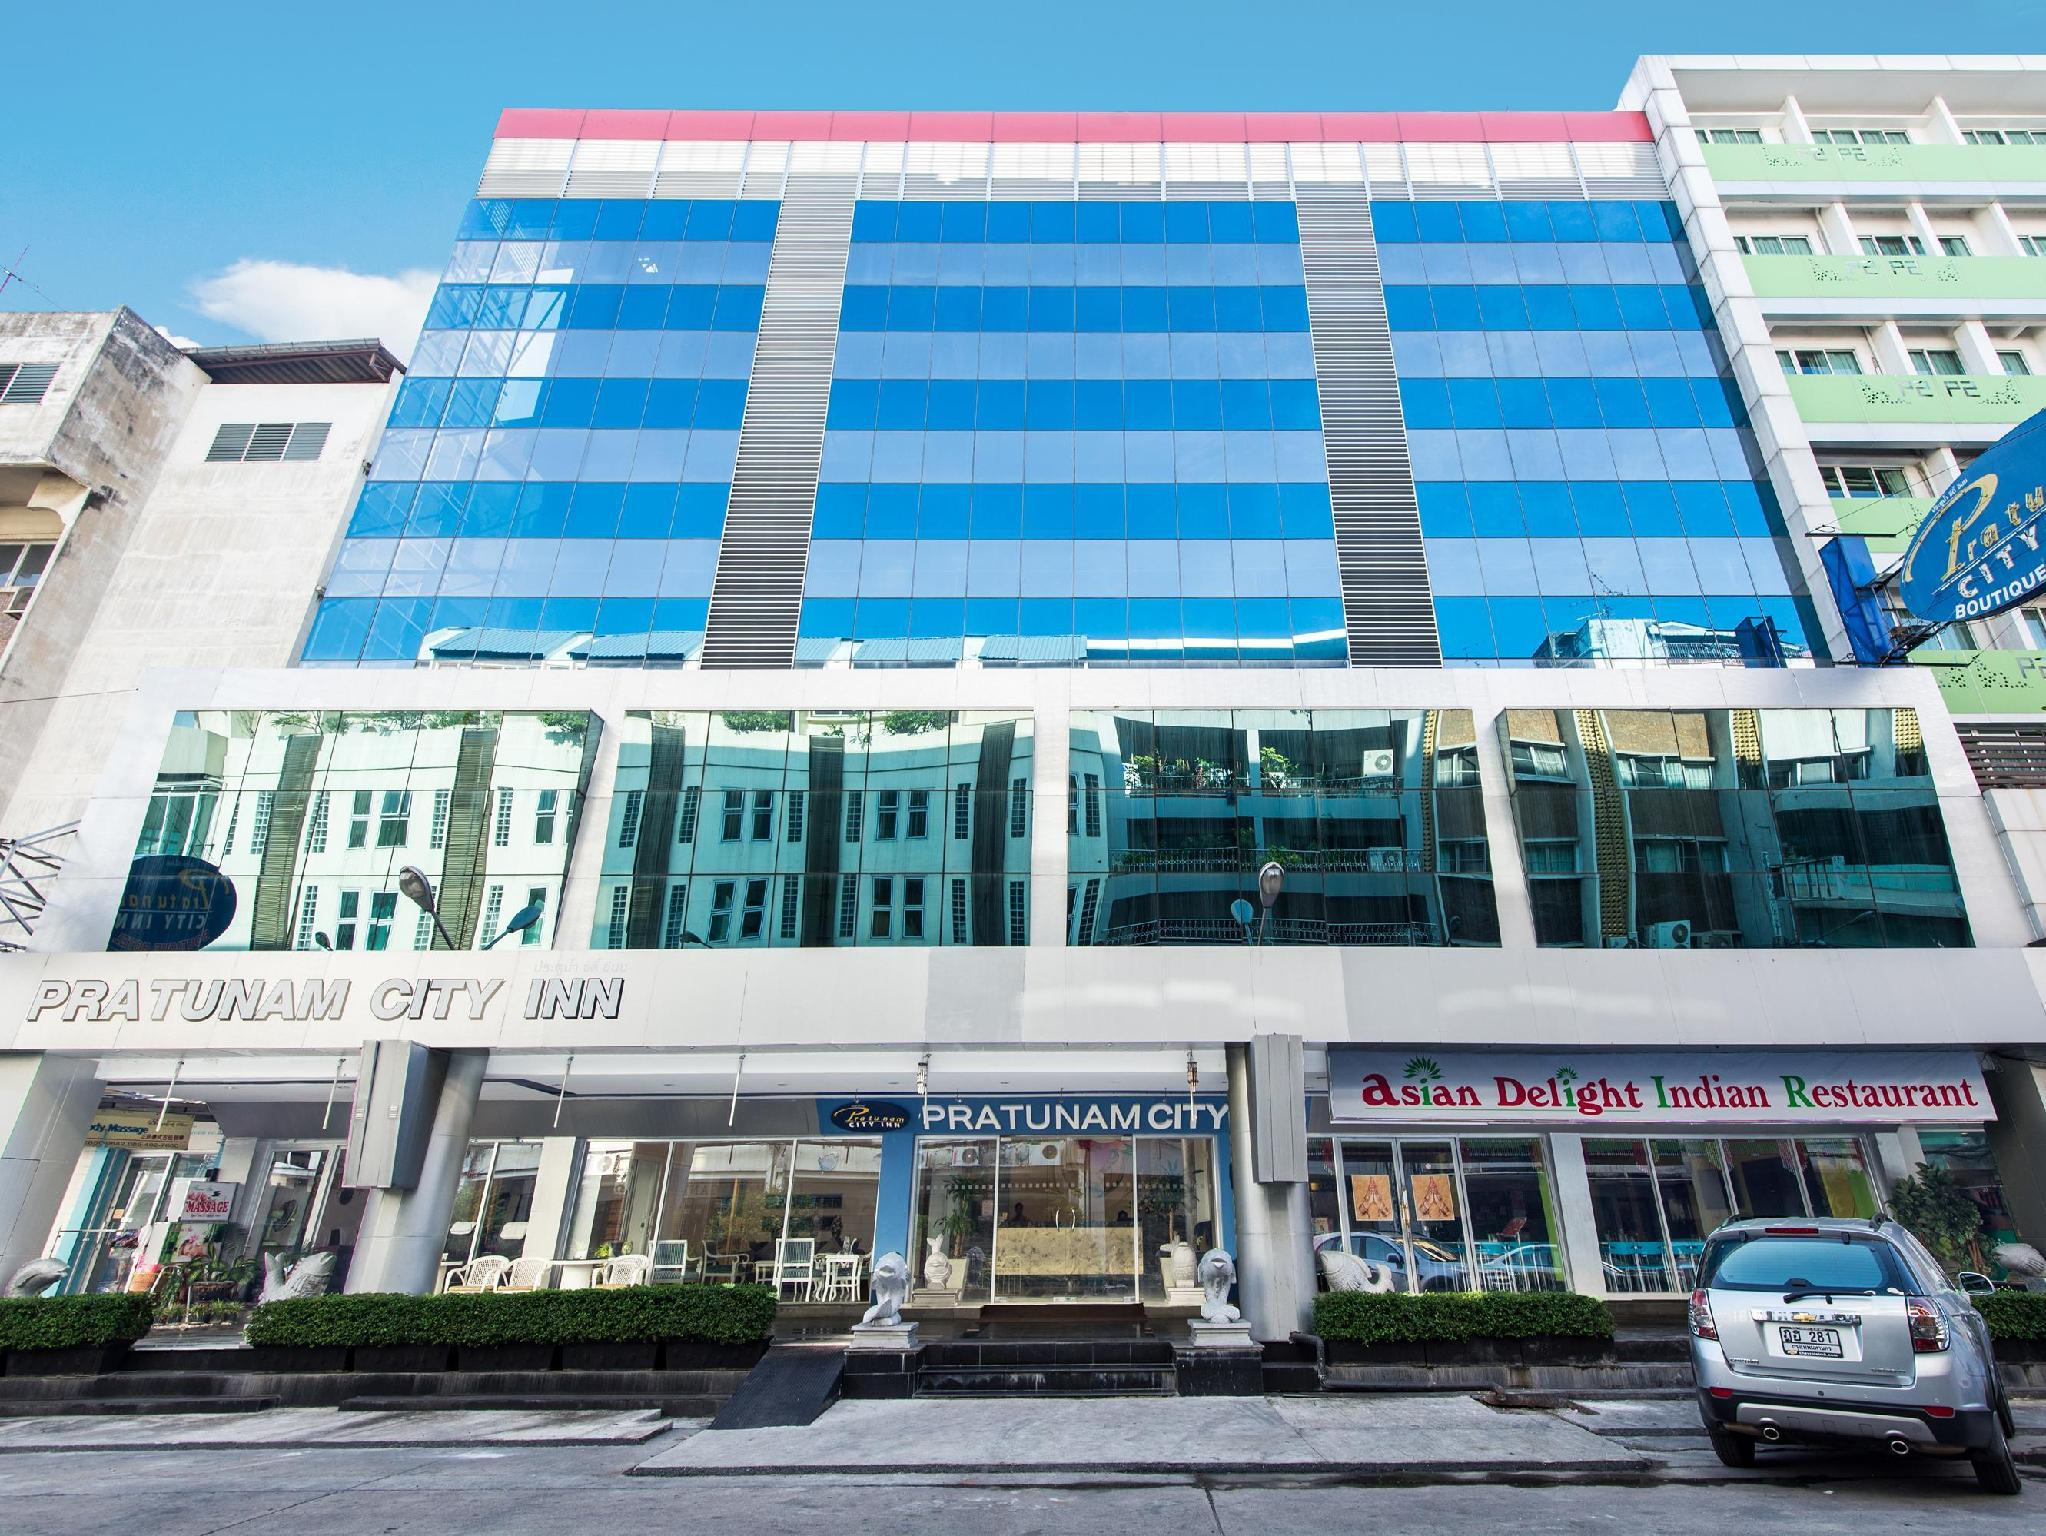 Pratunam City Inn Hotel